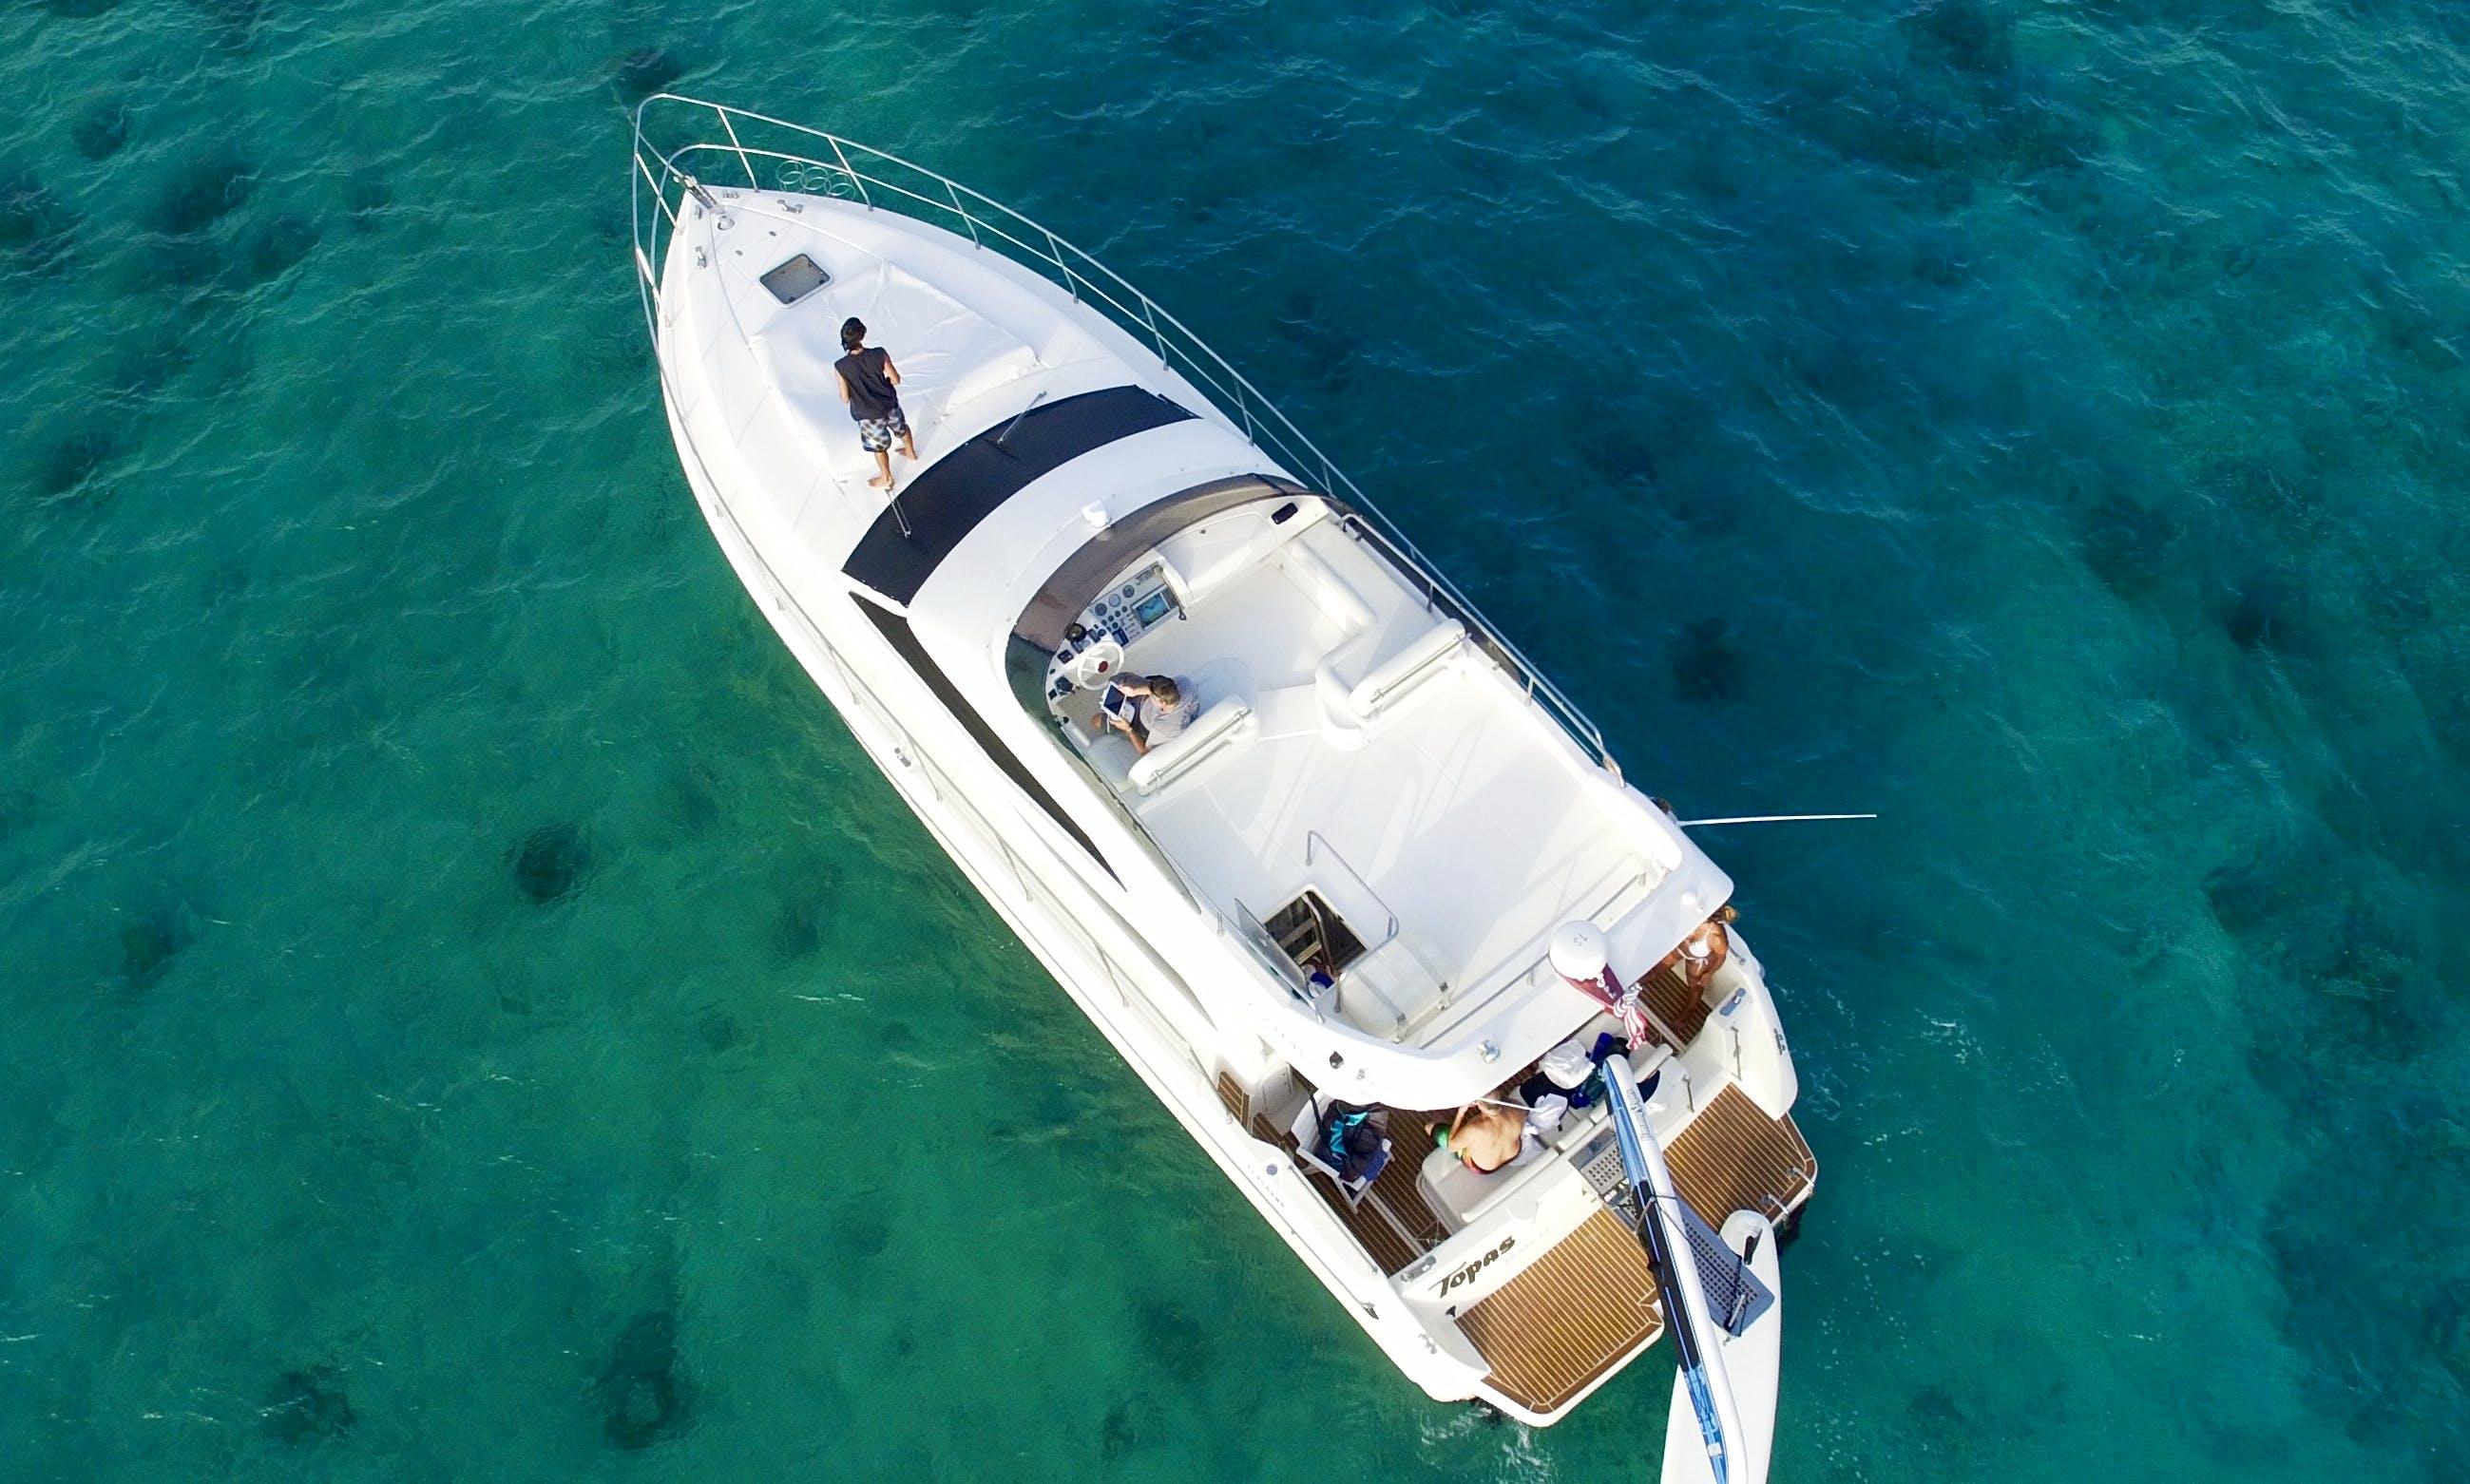 47' Motor Yacht Charter in Playa del Carmen, Mexico